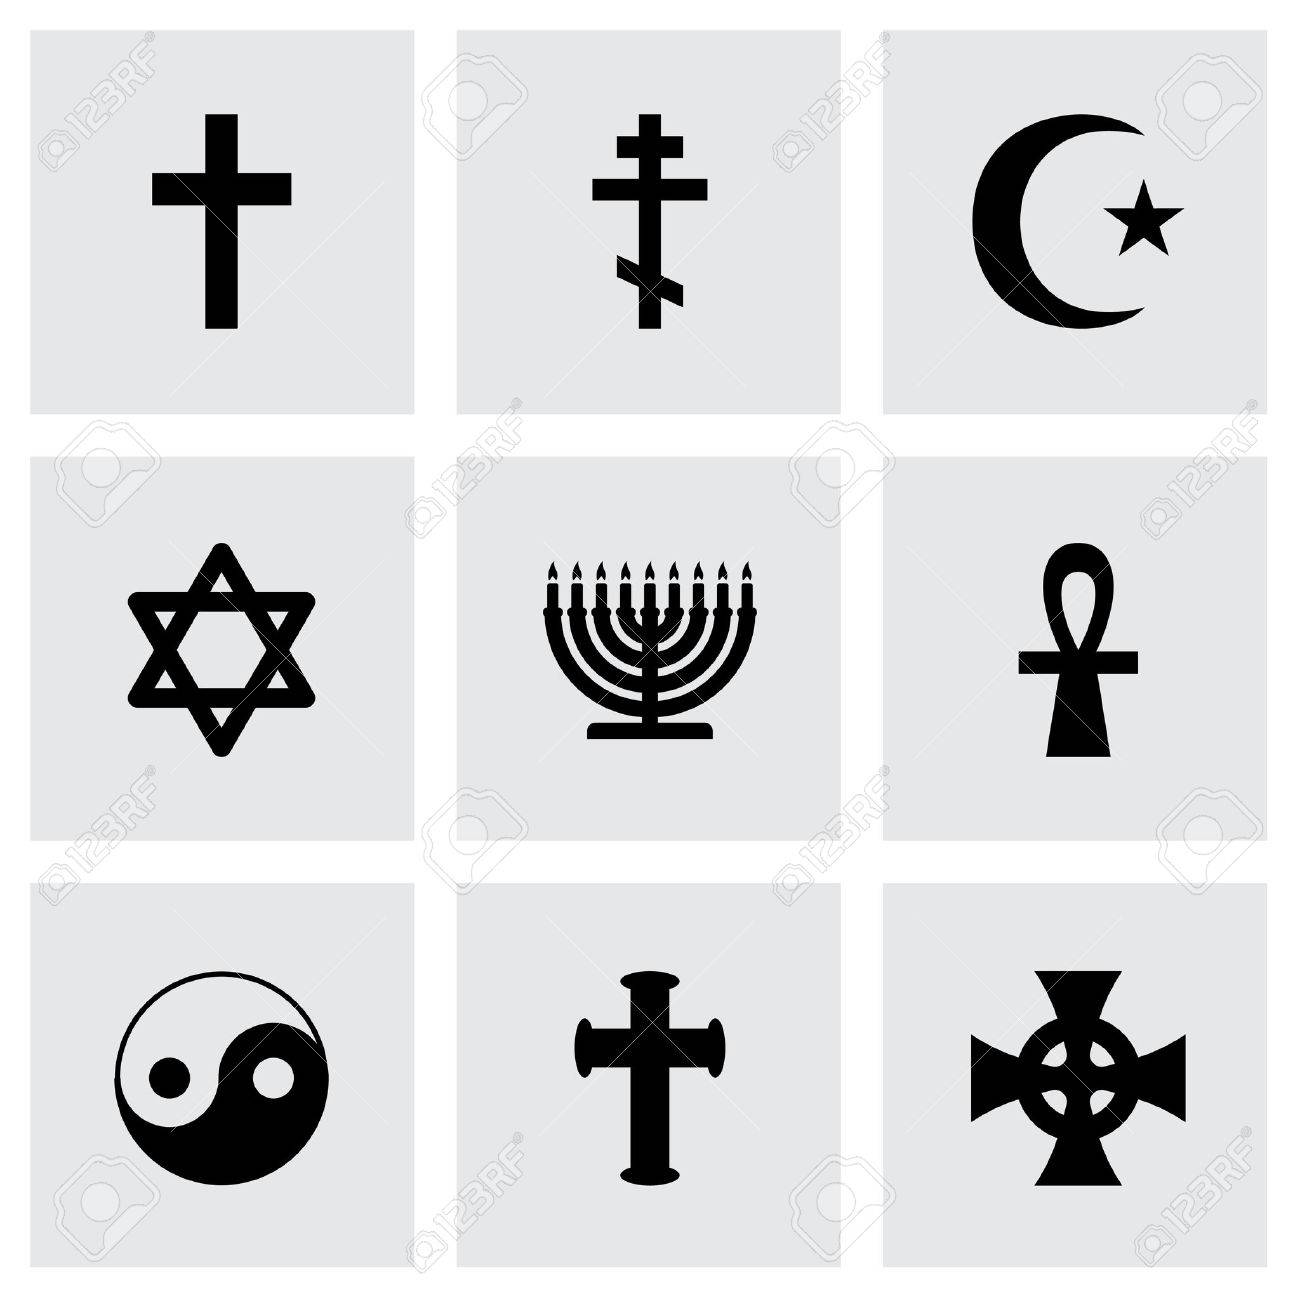 Religious symbols icon set on grey background royalty free religious symbols icon set on grey background stock vector 38739535 biocorpaavc